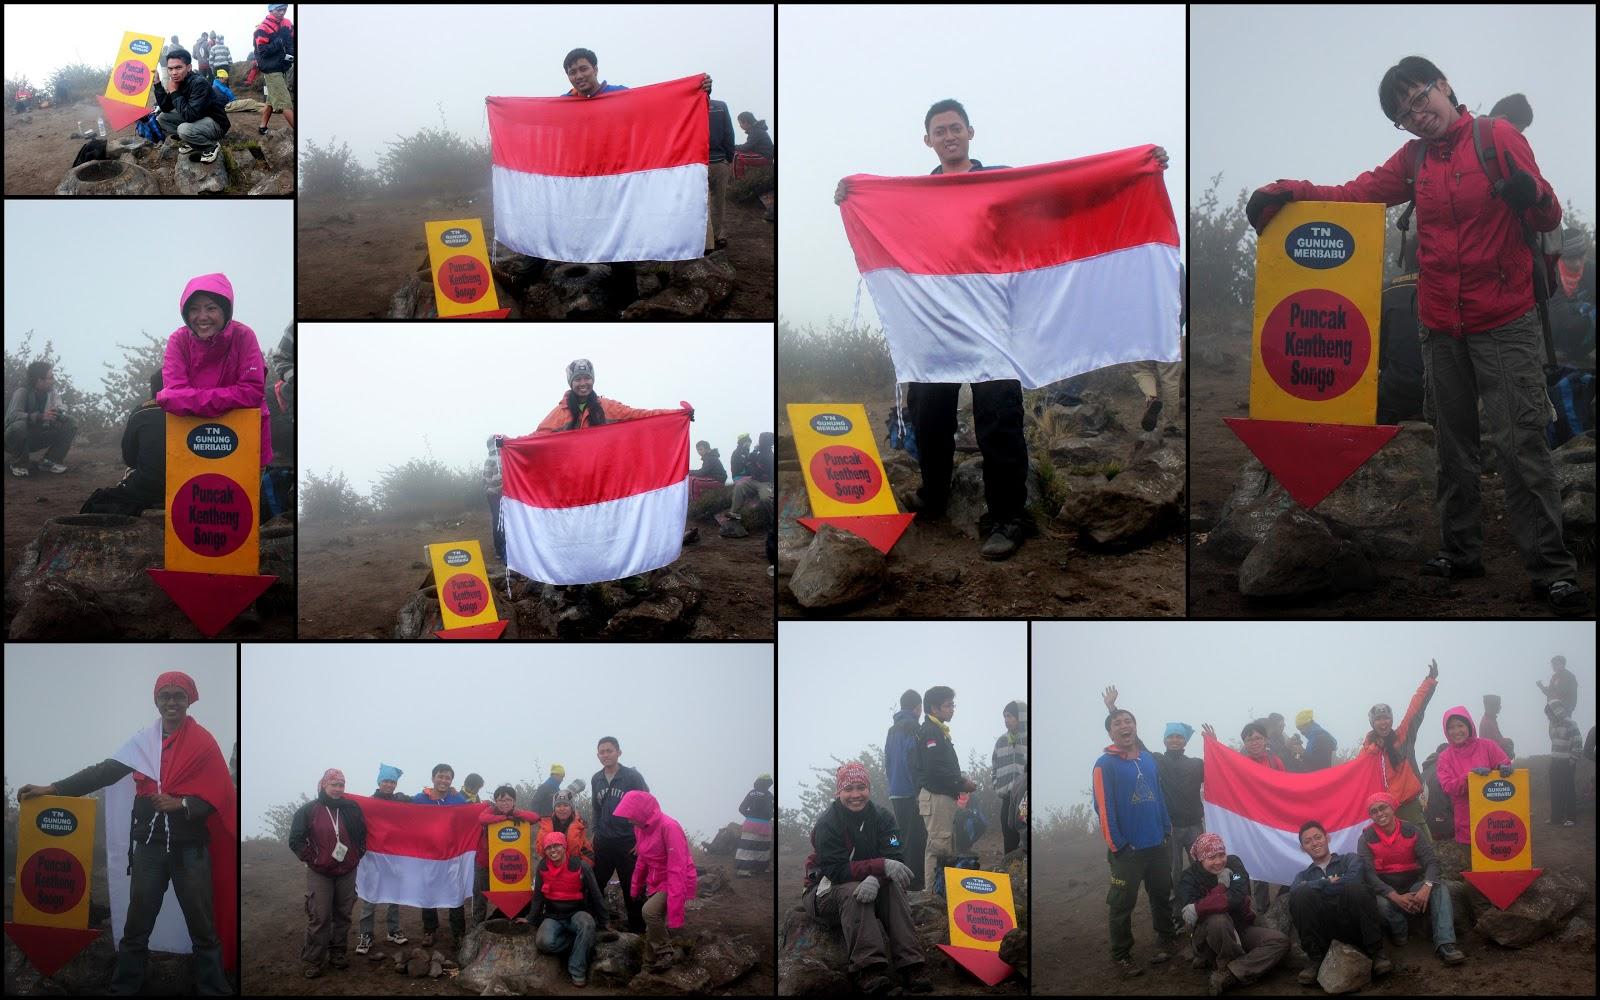 Misty Merbabu 5 8 Oktober 2012 My Journey Bendera Merah Putih Plastik Flag Palstik Menit Kemudian Semua Rombongan Udah Sampai Di Puncak Kenteng Songo Langsung Ambil Banner Pendakian Dan